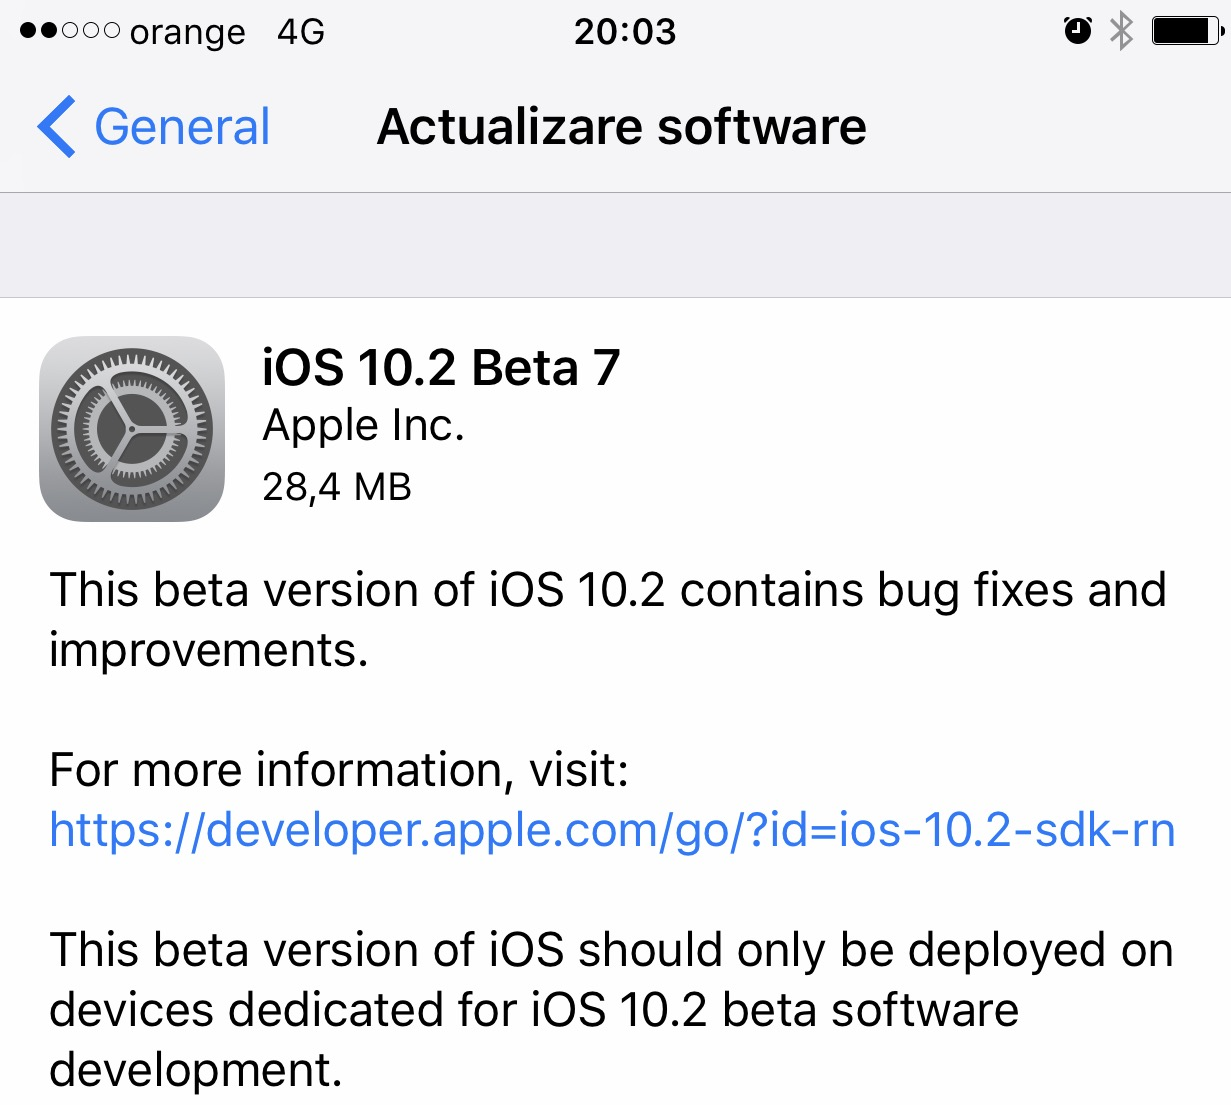 iOS 10.2 beta 7